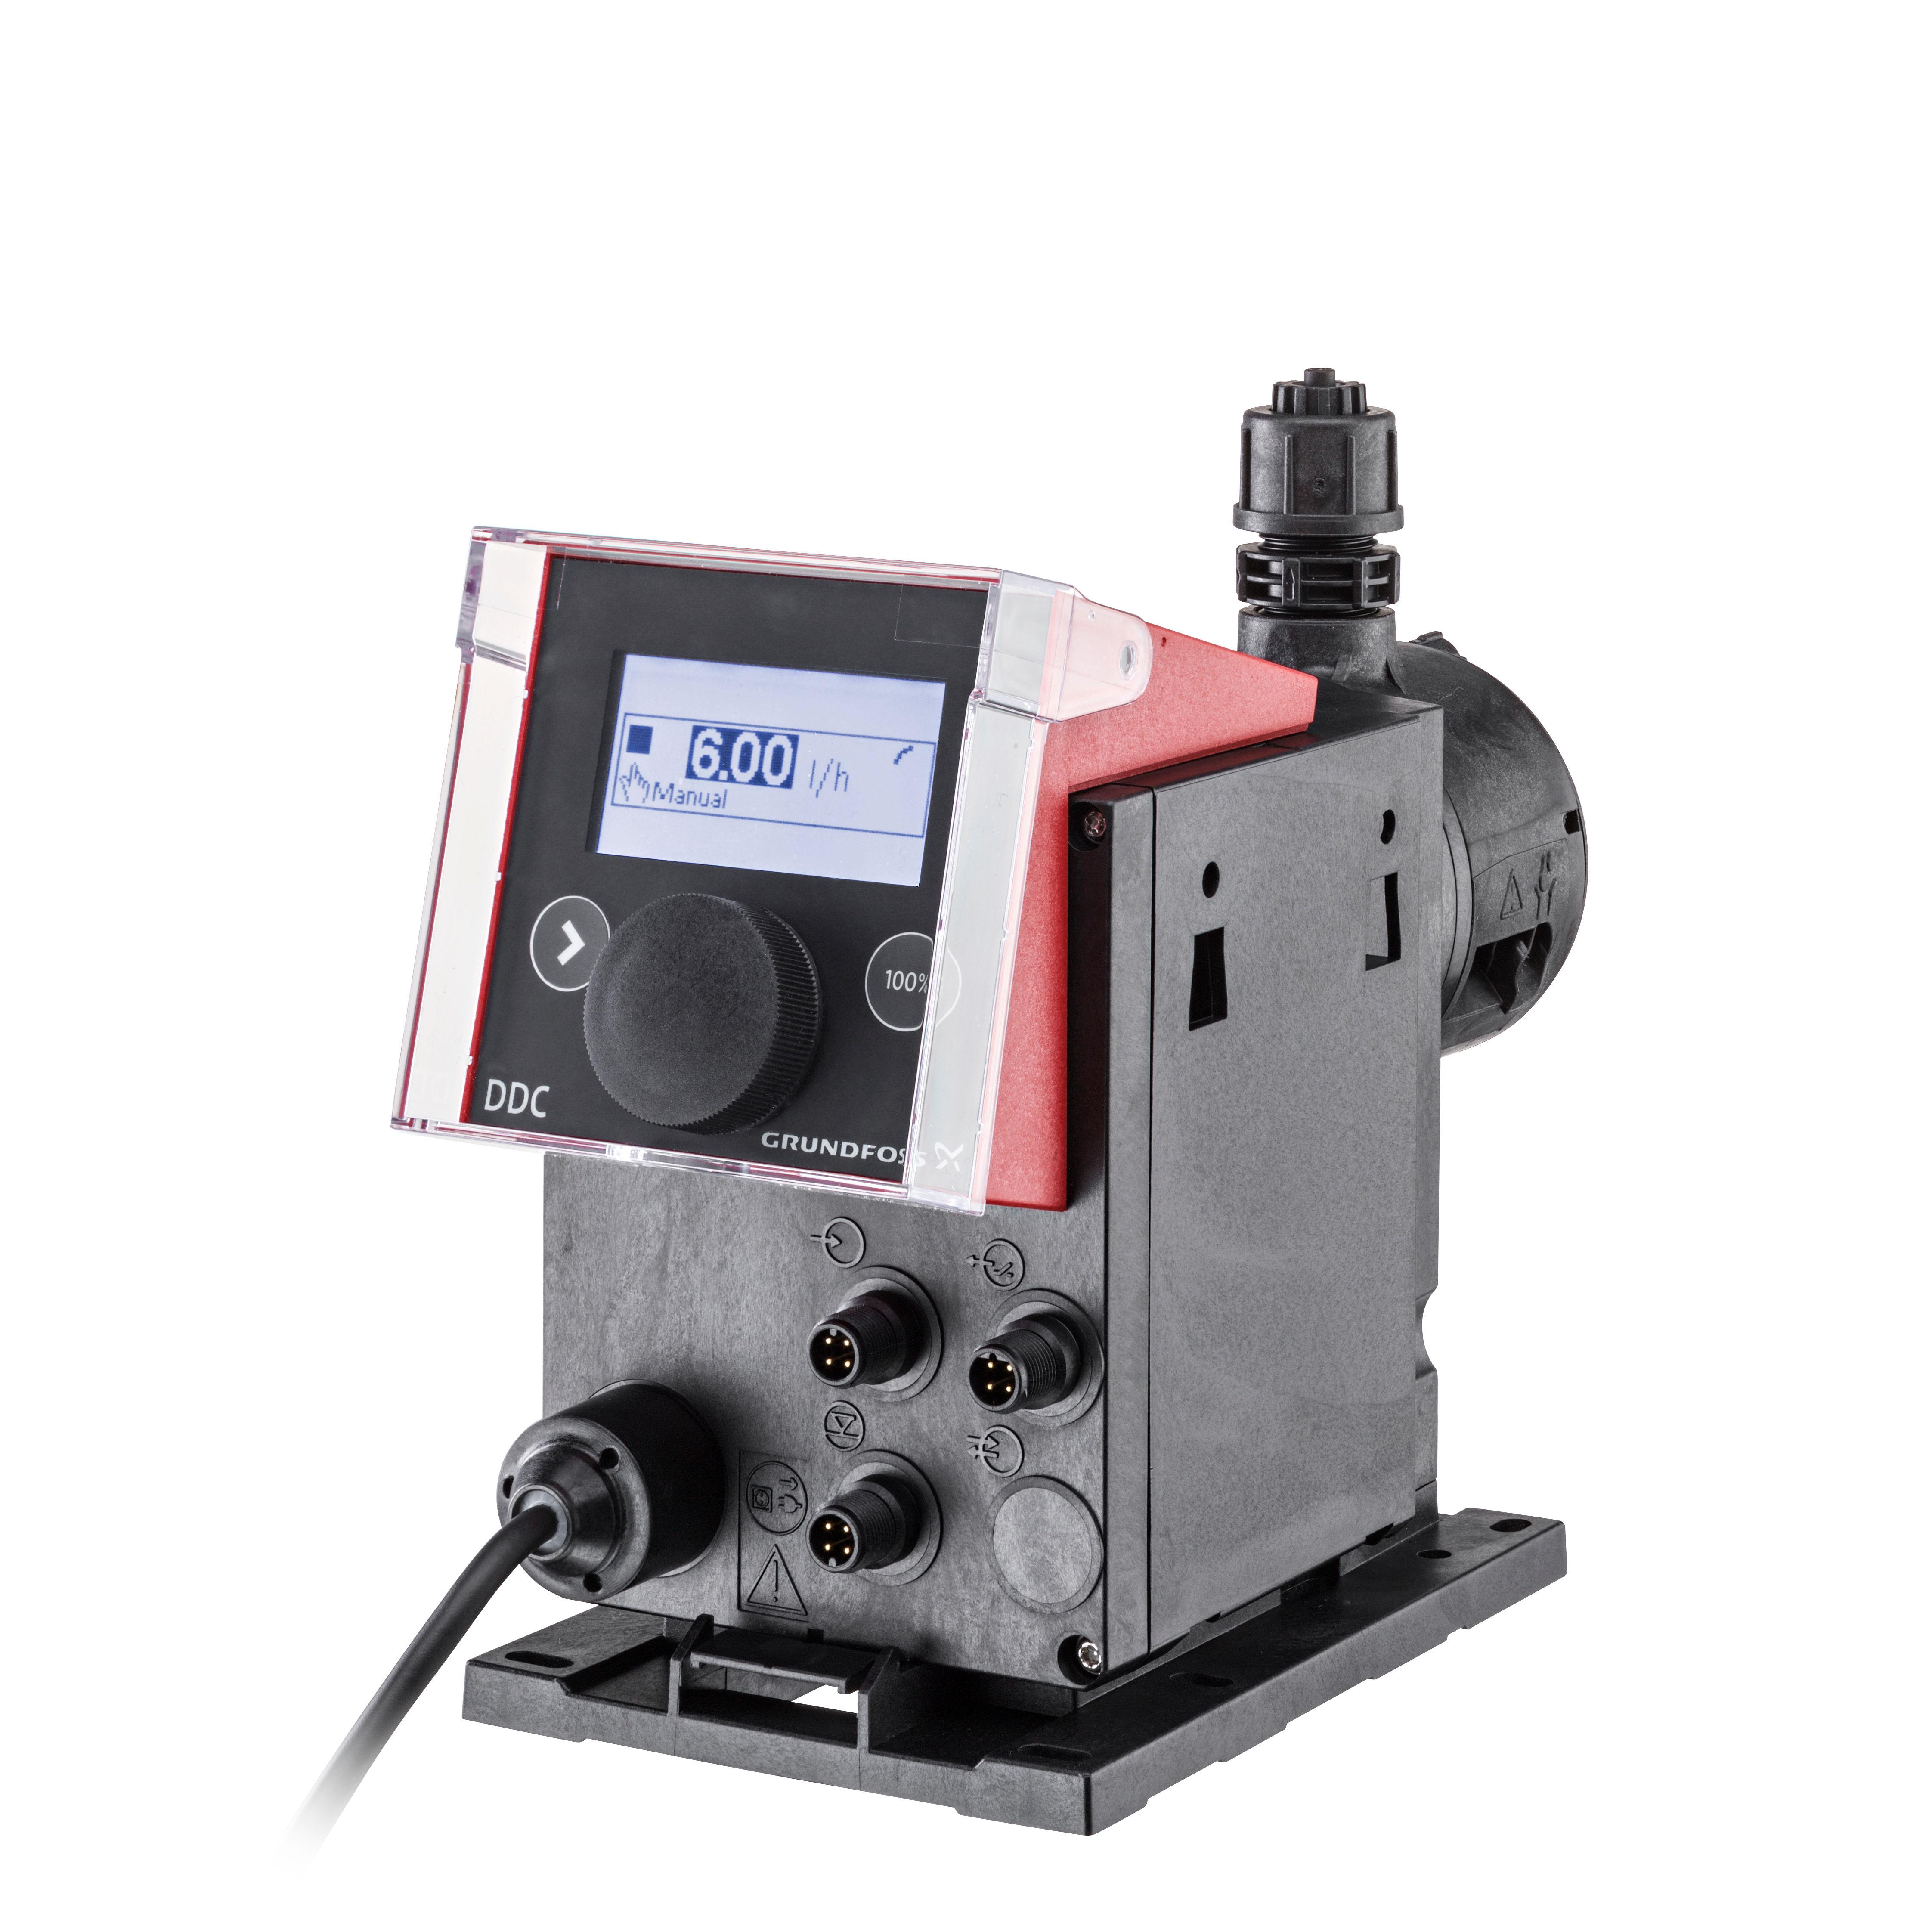 Grundfos DDC 9-7 AR Schrittmotorpumpe